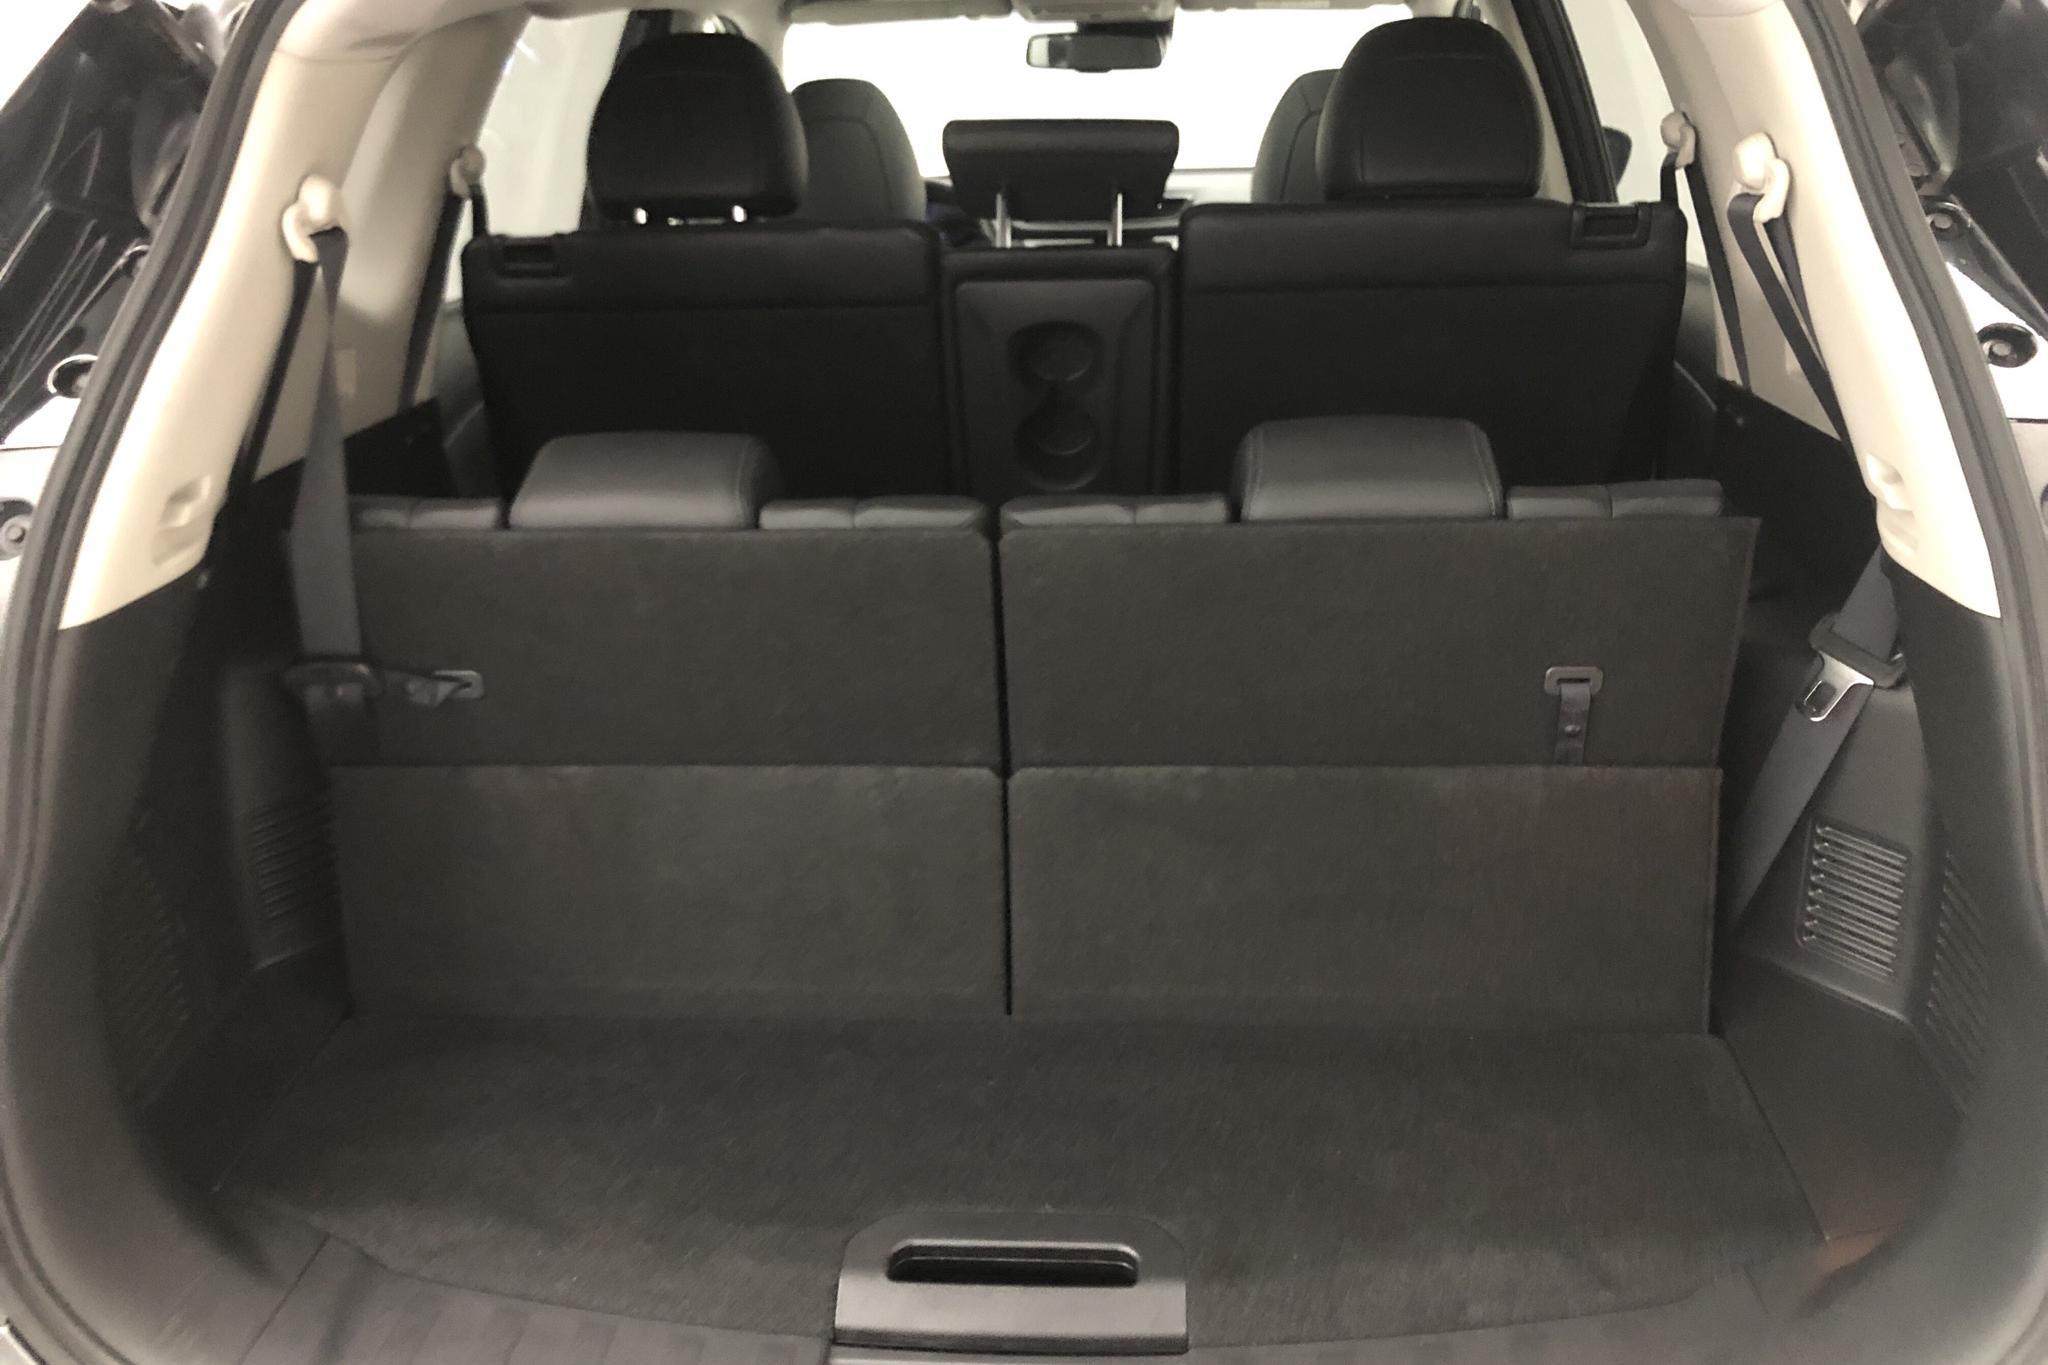 Nissan X-trail 1.6 dCi 2WD (130hk) - 45 060 km - Automatic - gray - 2017